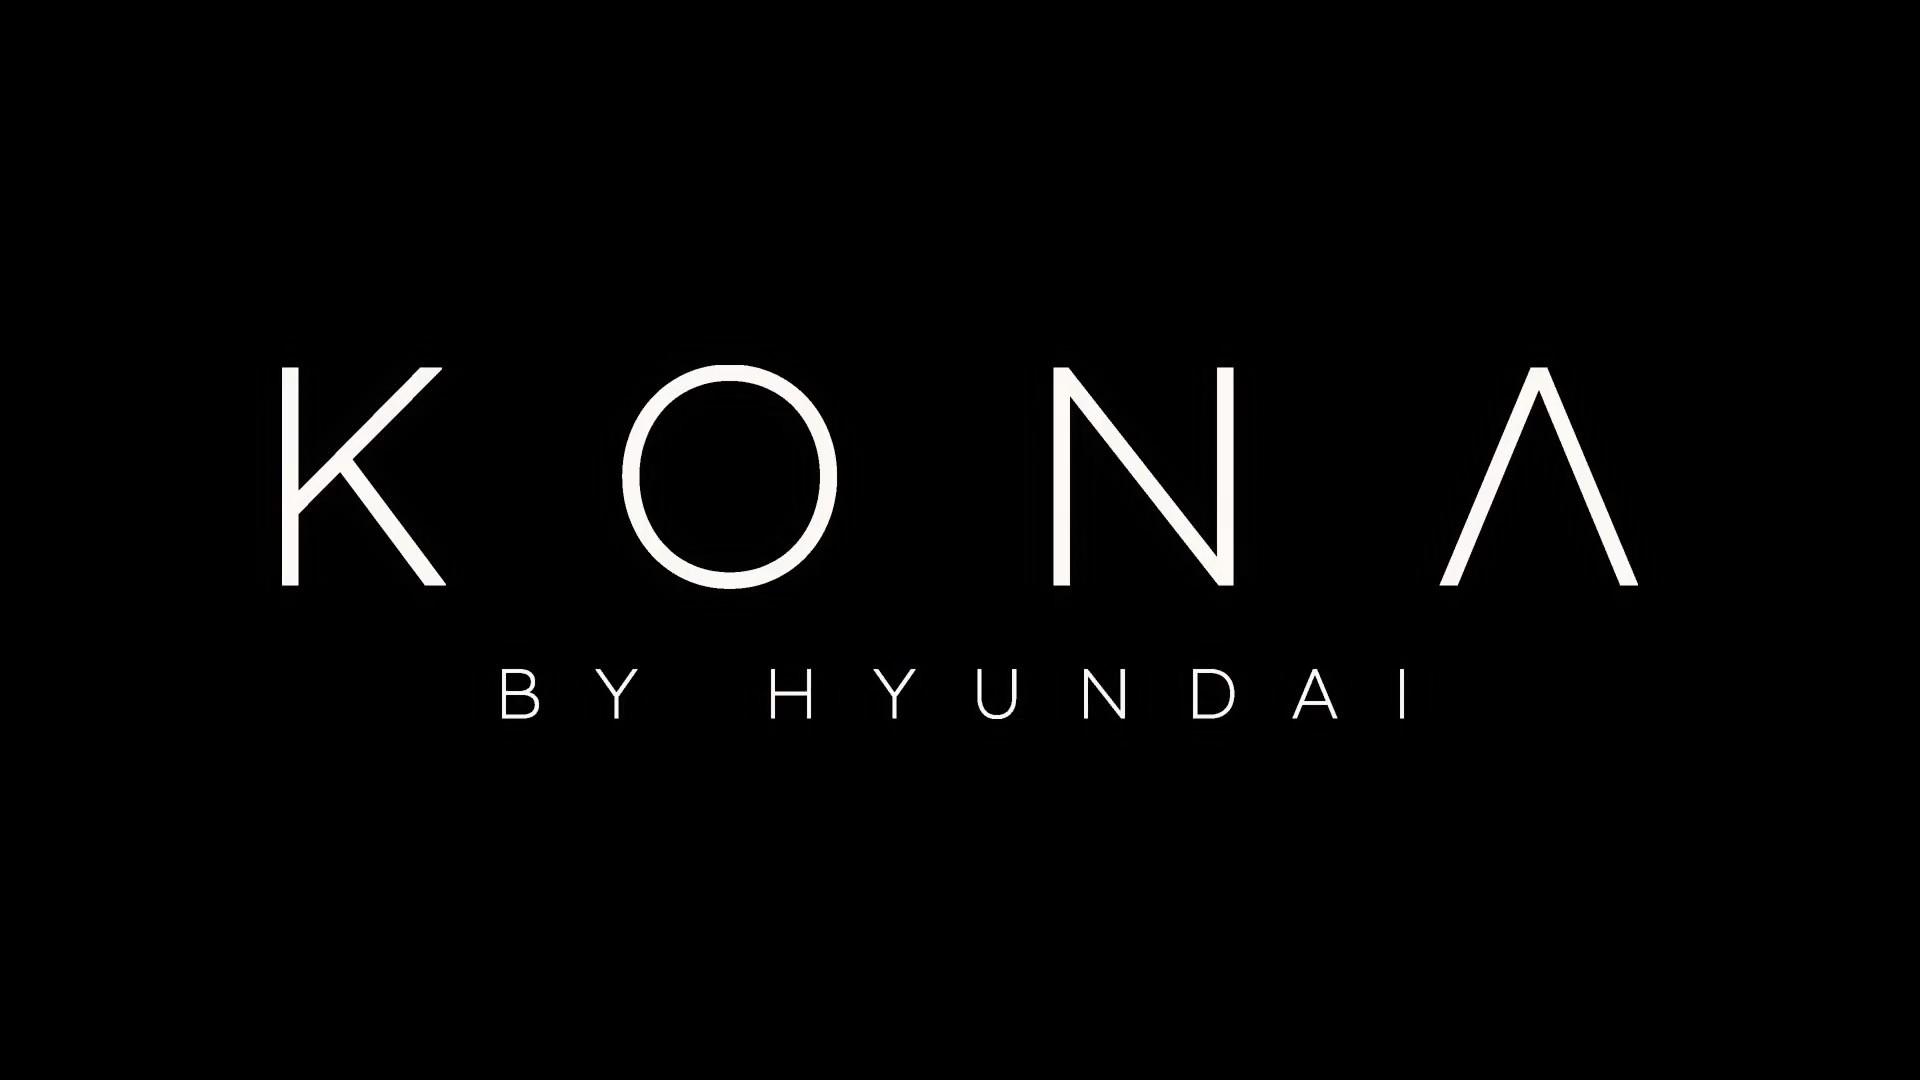 2018 hyundai kona suv. fine suv 2018 hyundai kona  and hyundai kona suv